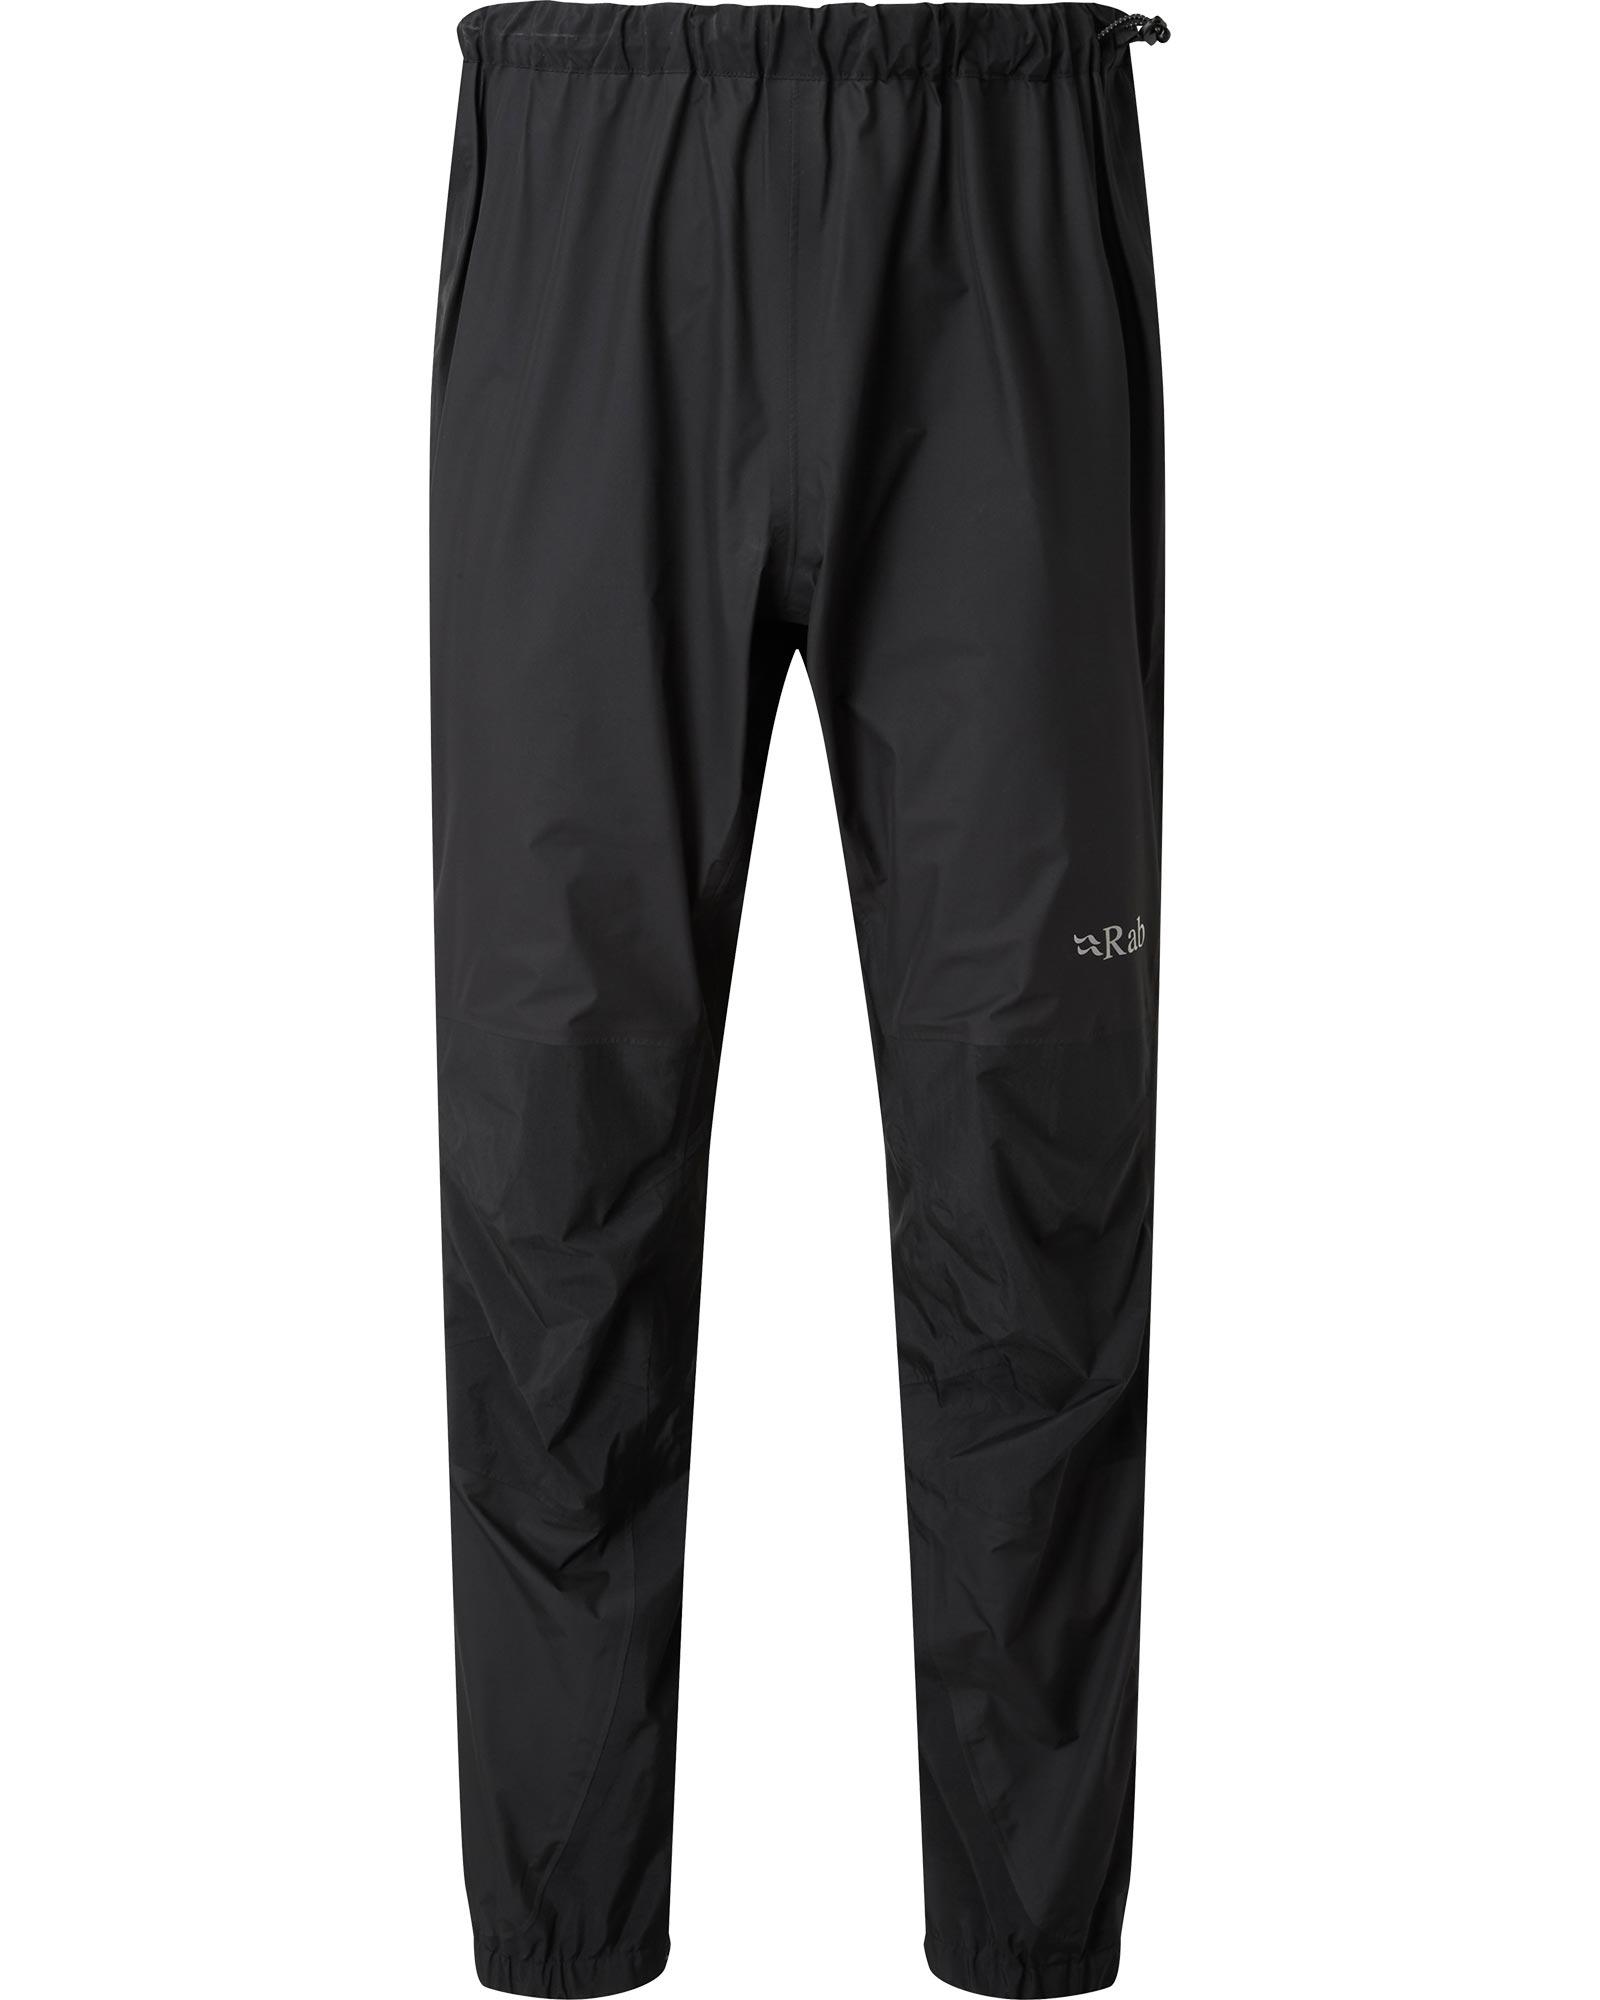 Rab Men's Zenith GORE-TEX PACLITE Plus Pants 0